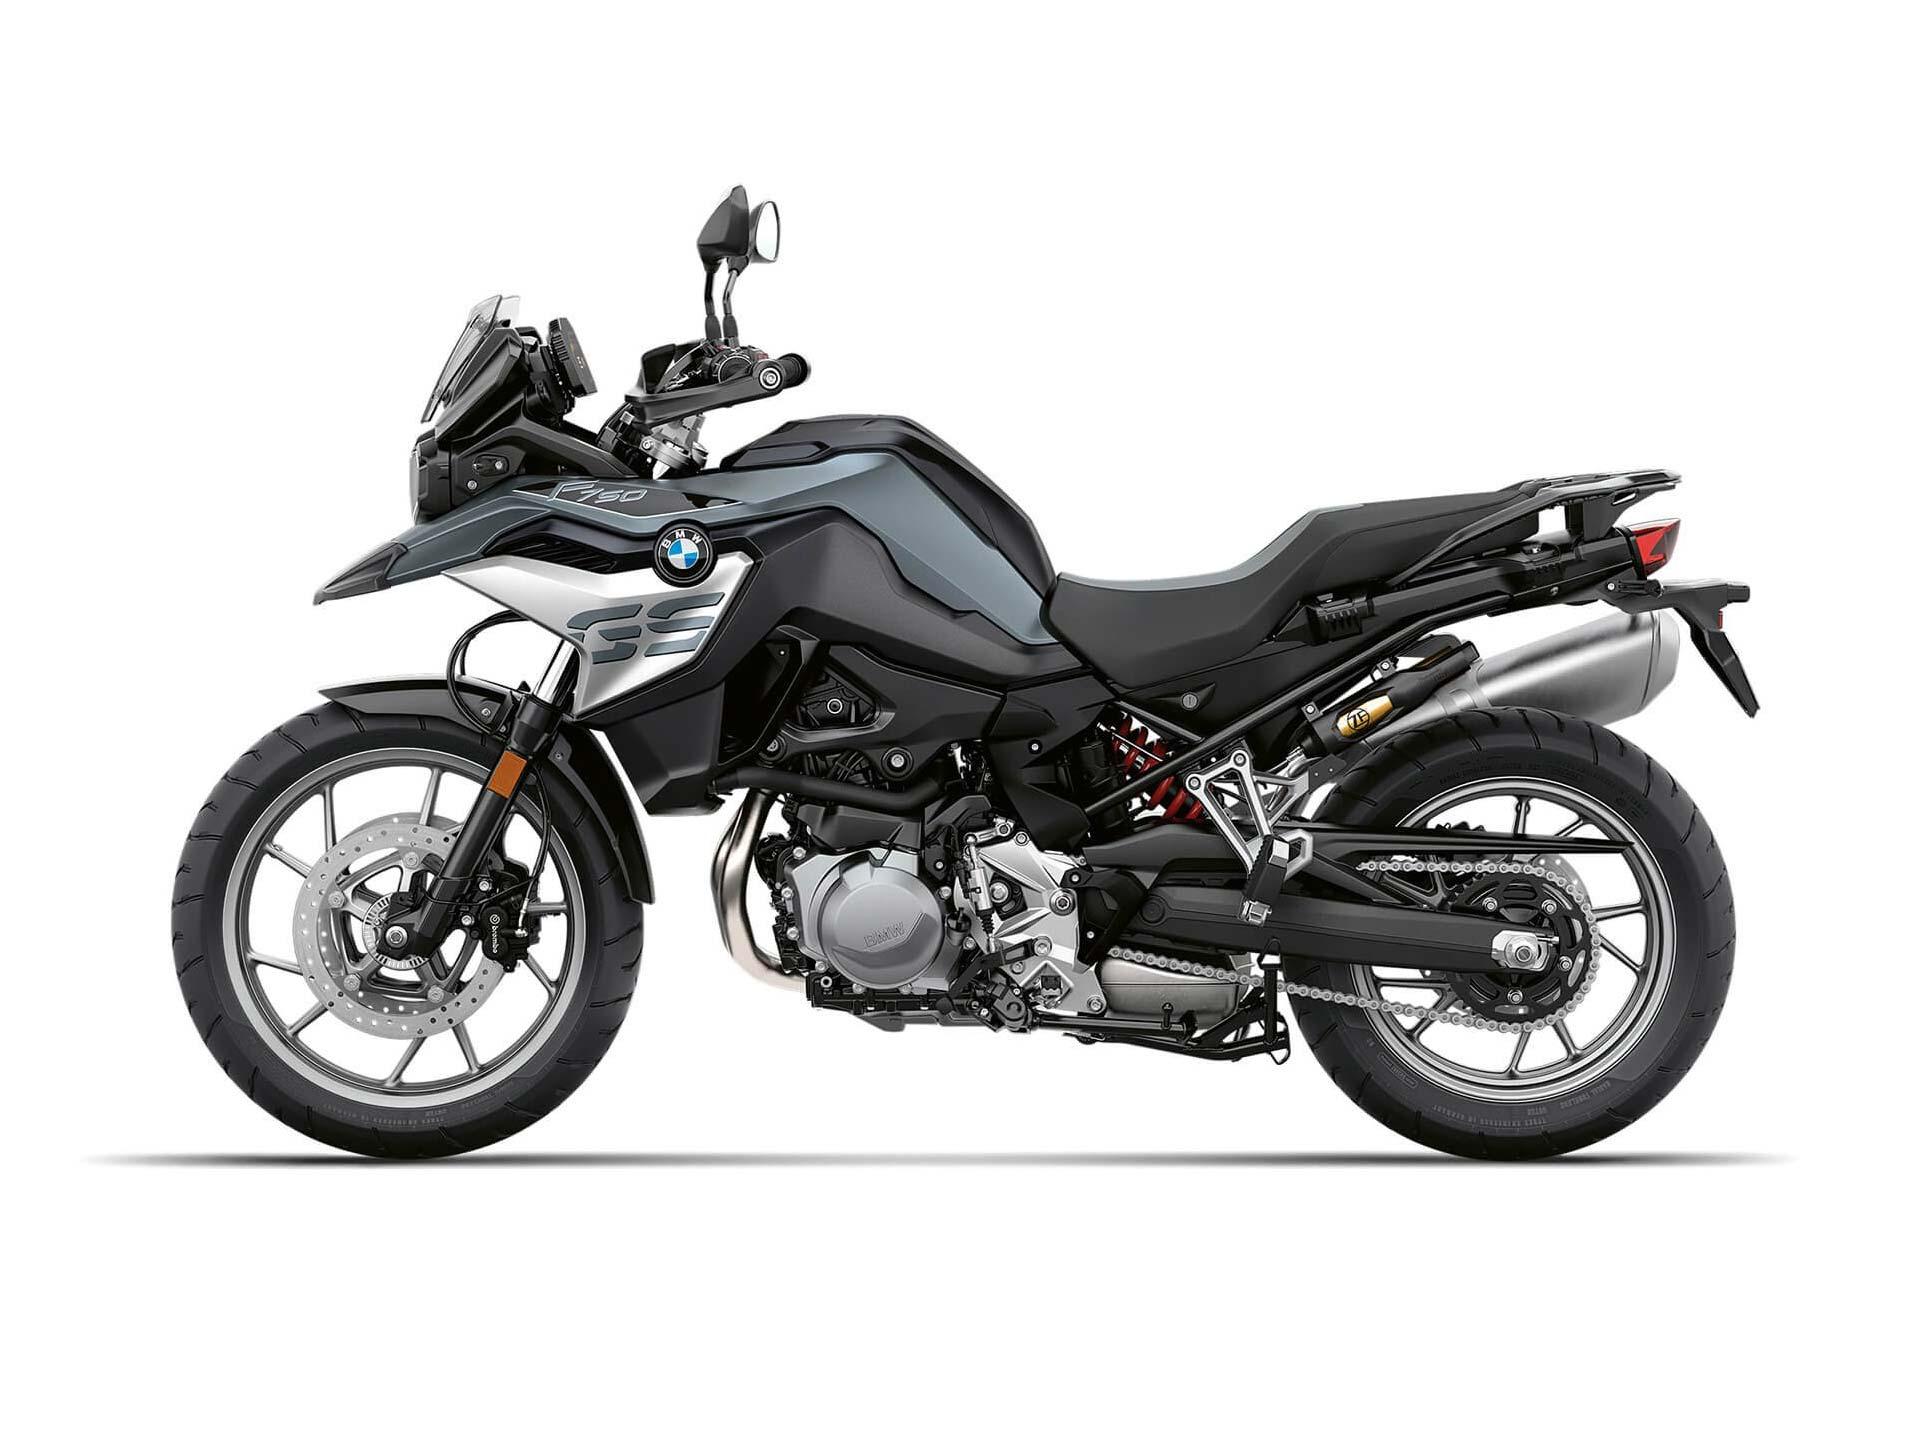 bmw-motorrad-f-750-gs-tour-ls